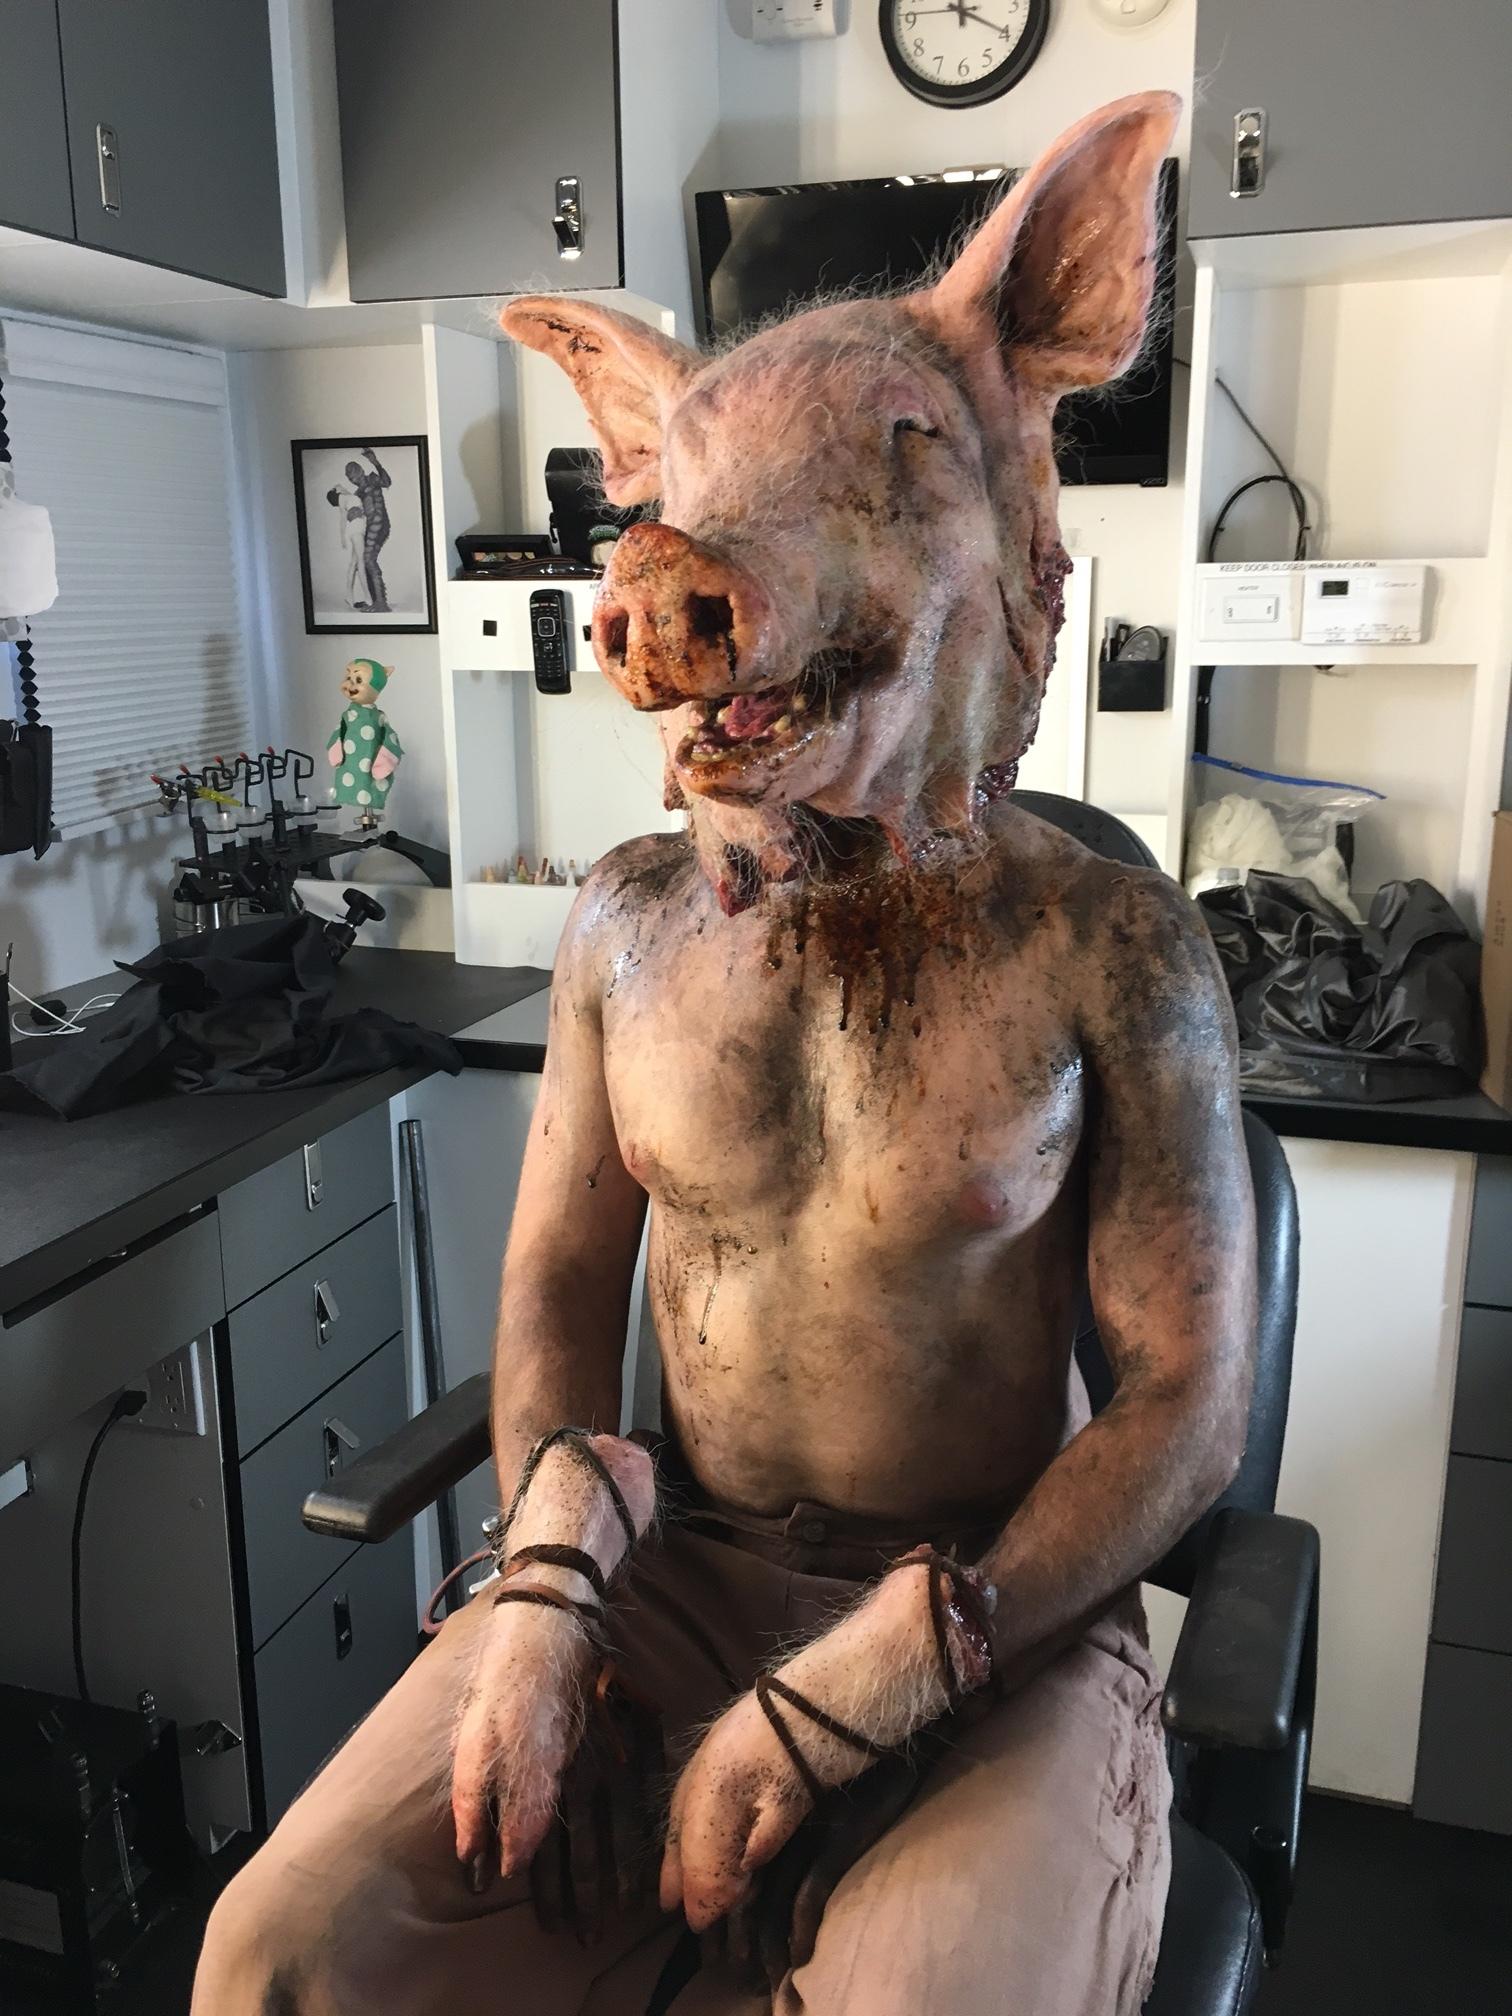 piggy man - american horror story: roanoke